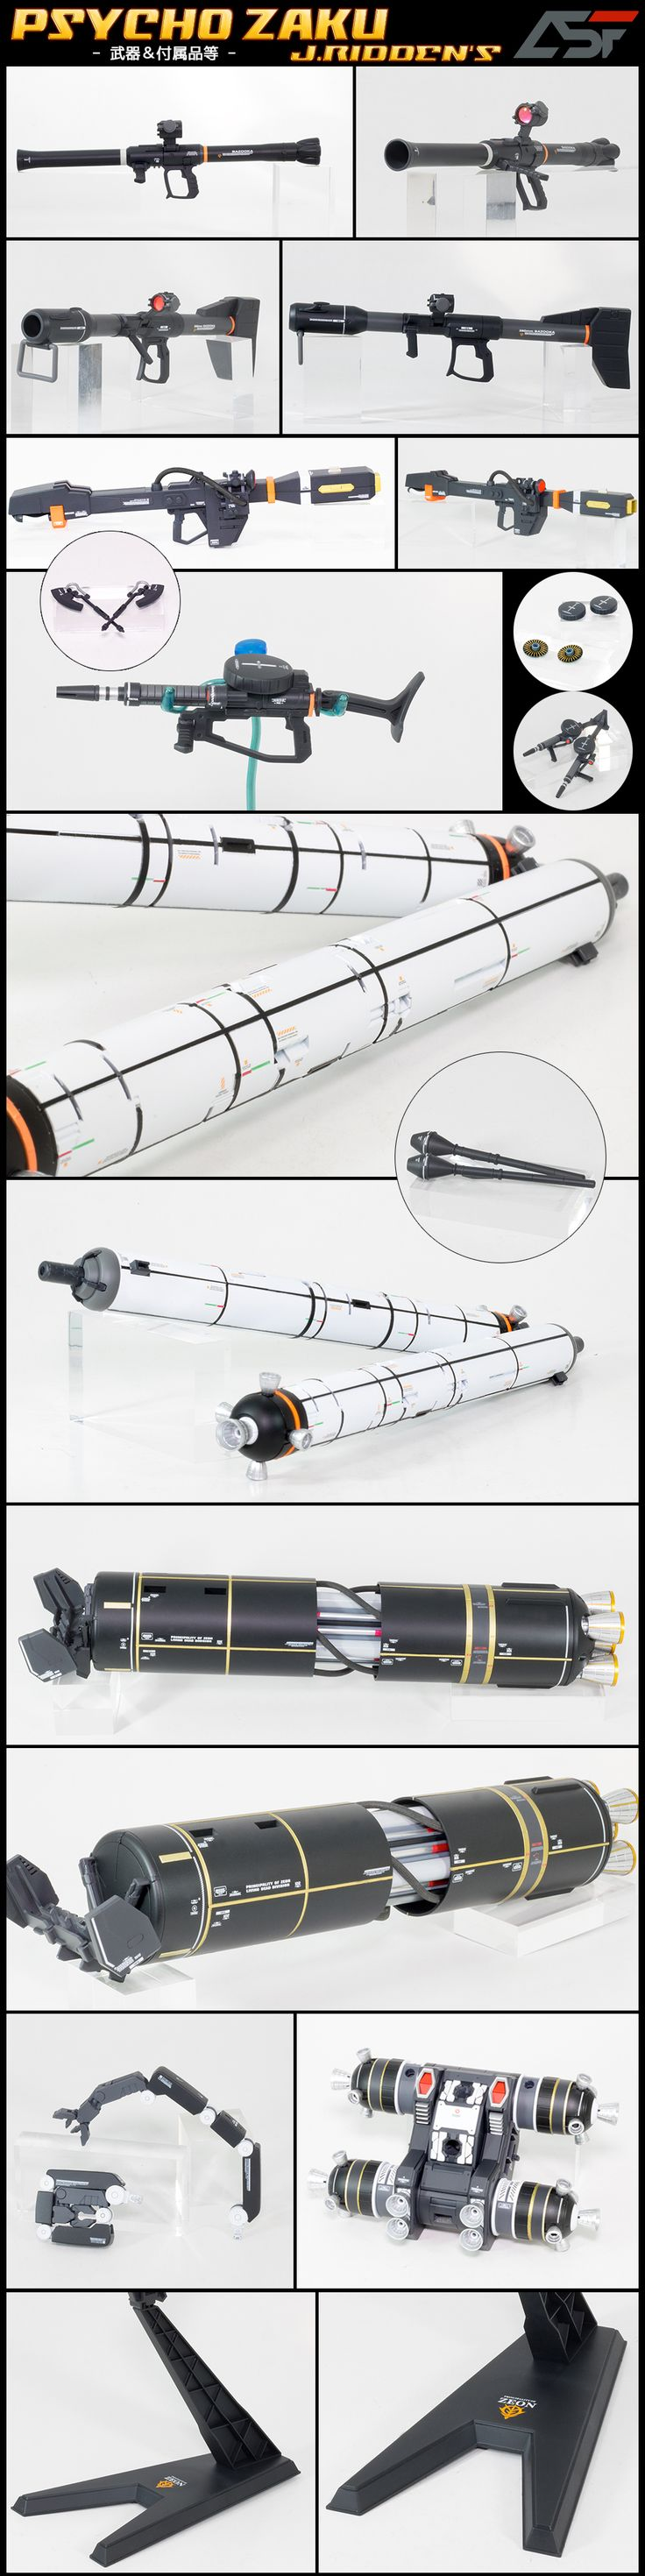 "MG1/100 PSYCHO ZAKU サイコザク ジョニーライデン 商品説明 ご覧いただきありがとう御座います。今回はMG1/100 PSYCHO ZAKU Ver.ka""ジョニーライデン機 完成品になります。---工作箇所---☆各所装甲の形状を変更☆スジ掘り直し 追加にてパネルラインの追加☆純正デカール プレミアムデカール使用☆塗装後、フラットクリアにて保護※写真にあるアクリルキューブは付属しません元箱をご希望の方はお知らせ下さい落札後48時間以内に連絡頂ける方3日以内に決済して頂ける方に"